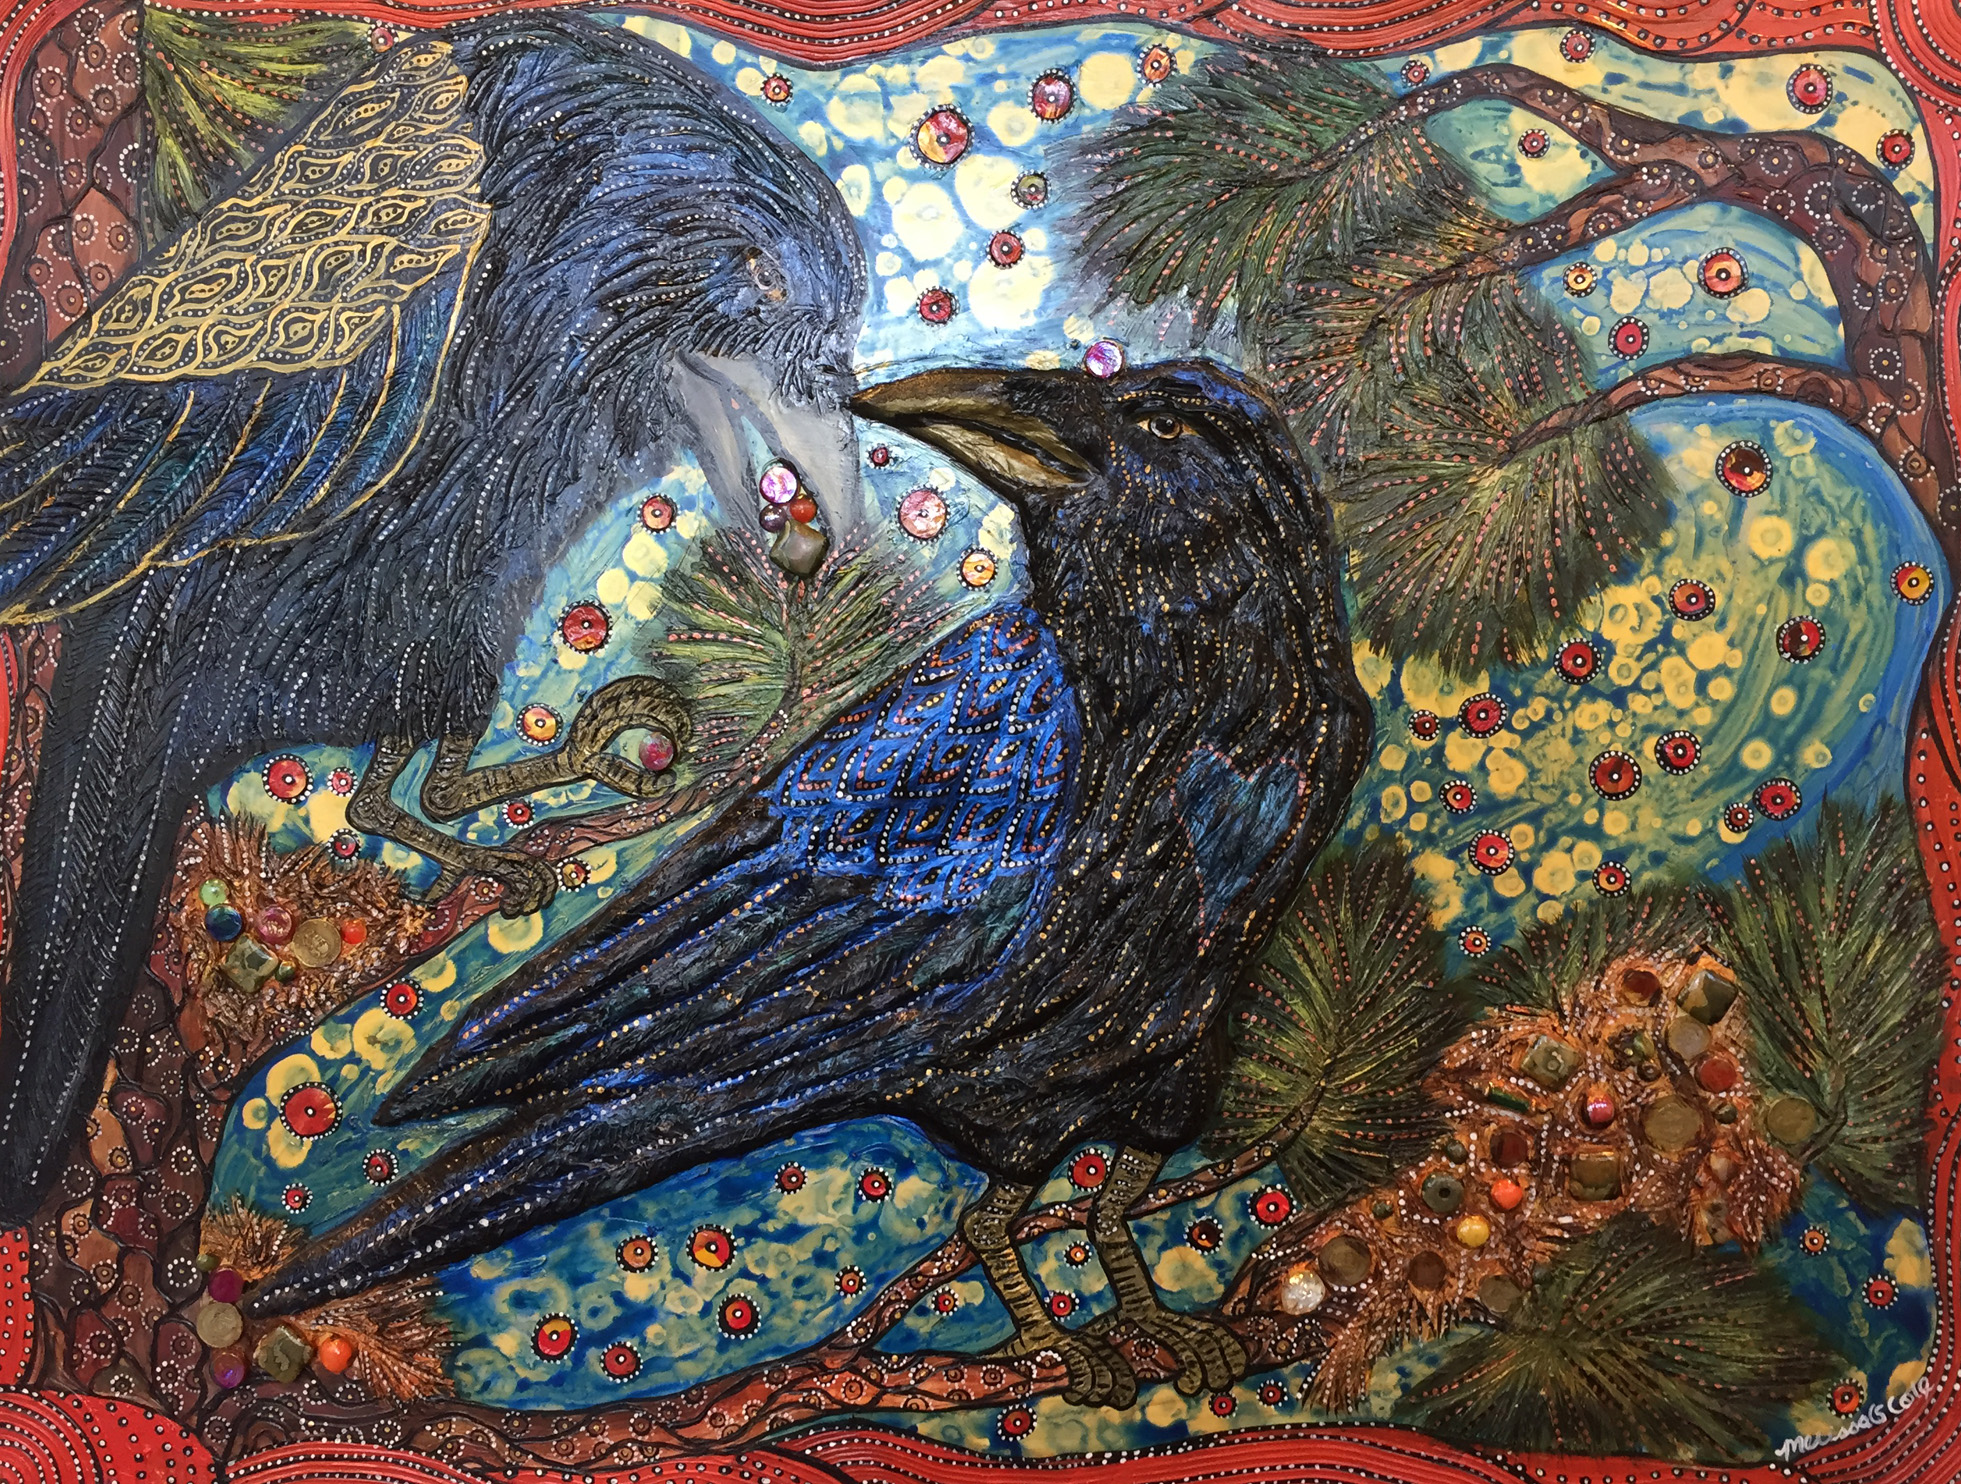 Greedy Ravens Melissa Cole.jpg